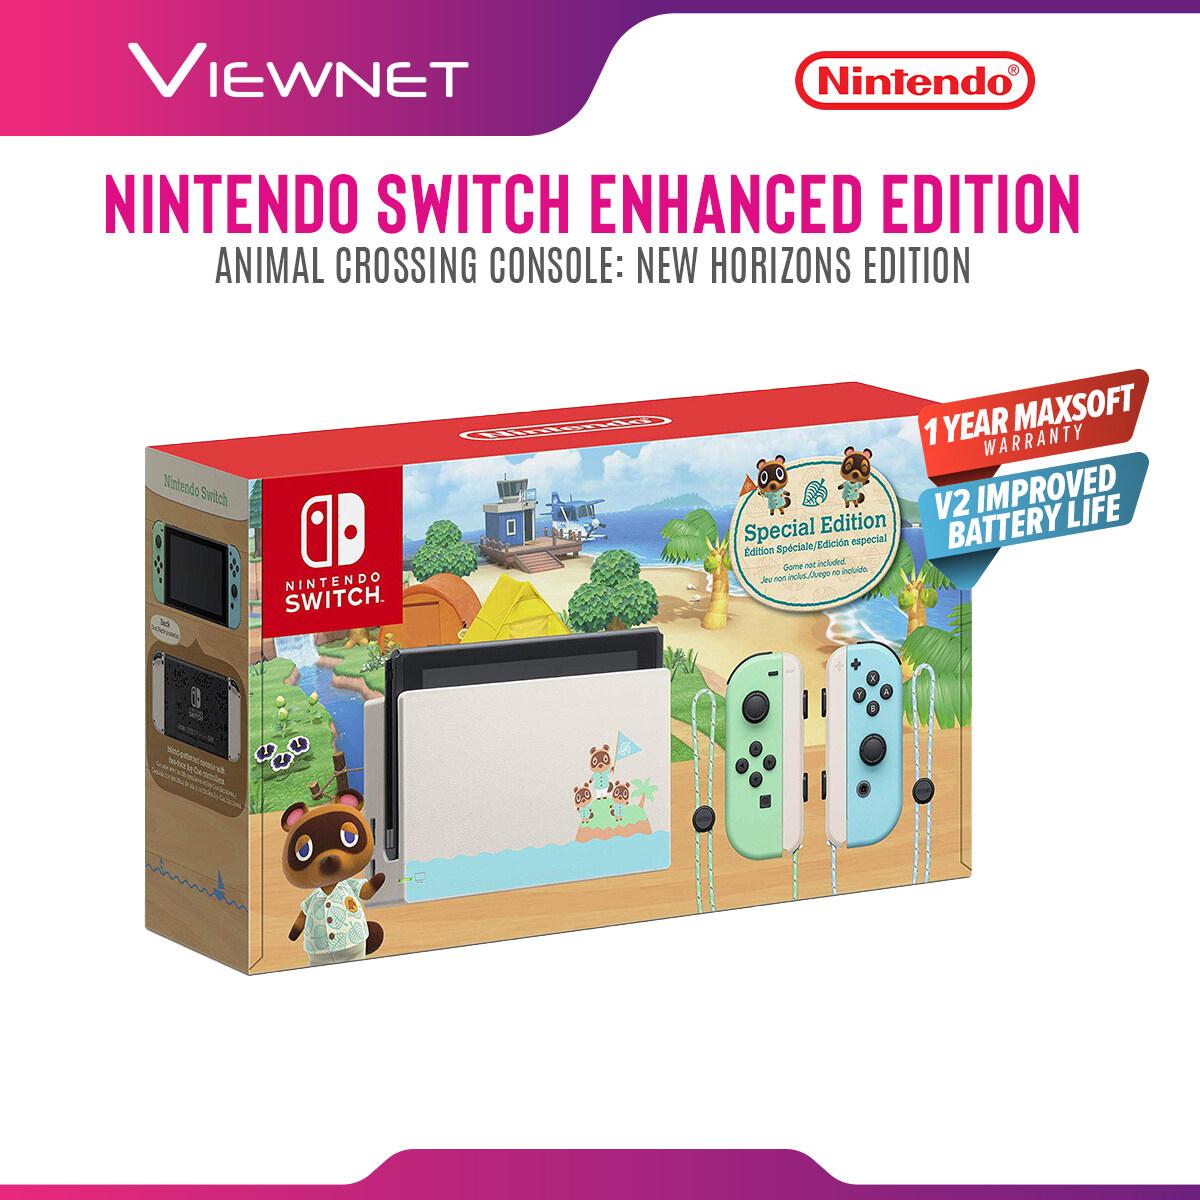 Nintendo Switch Animal Crossing New Horizon Enhanced Battery Special Edition (Maxsoft Warranty)